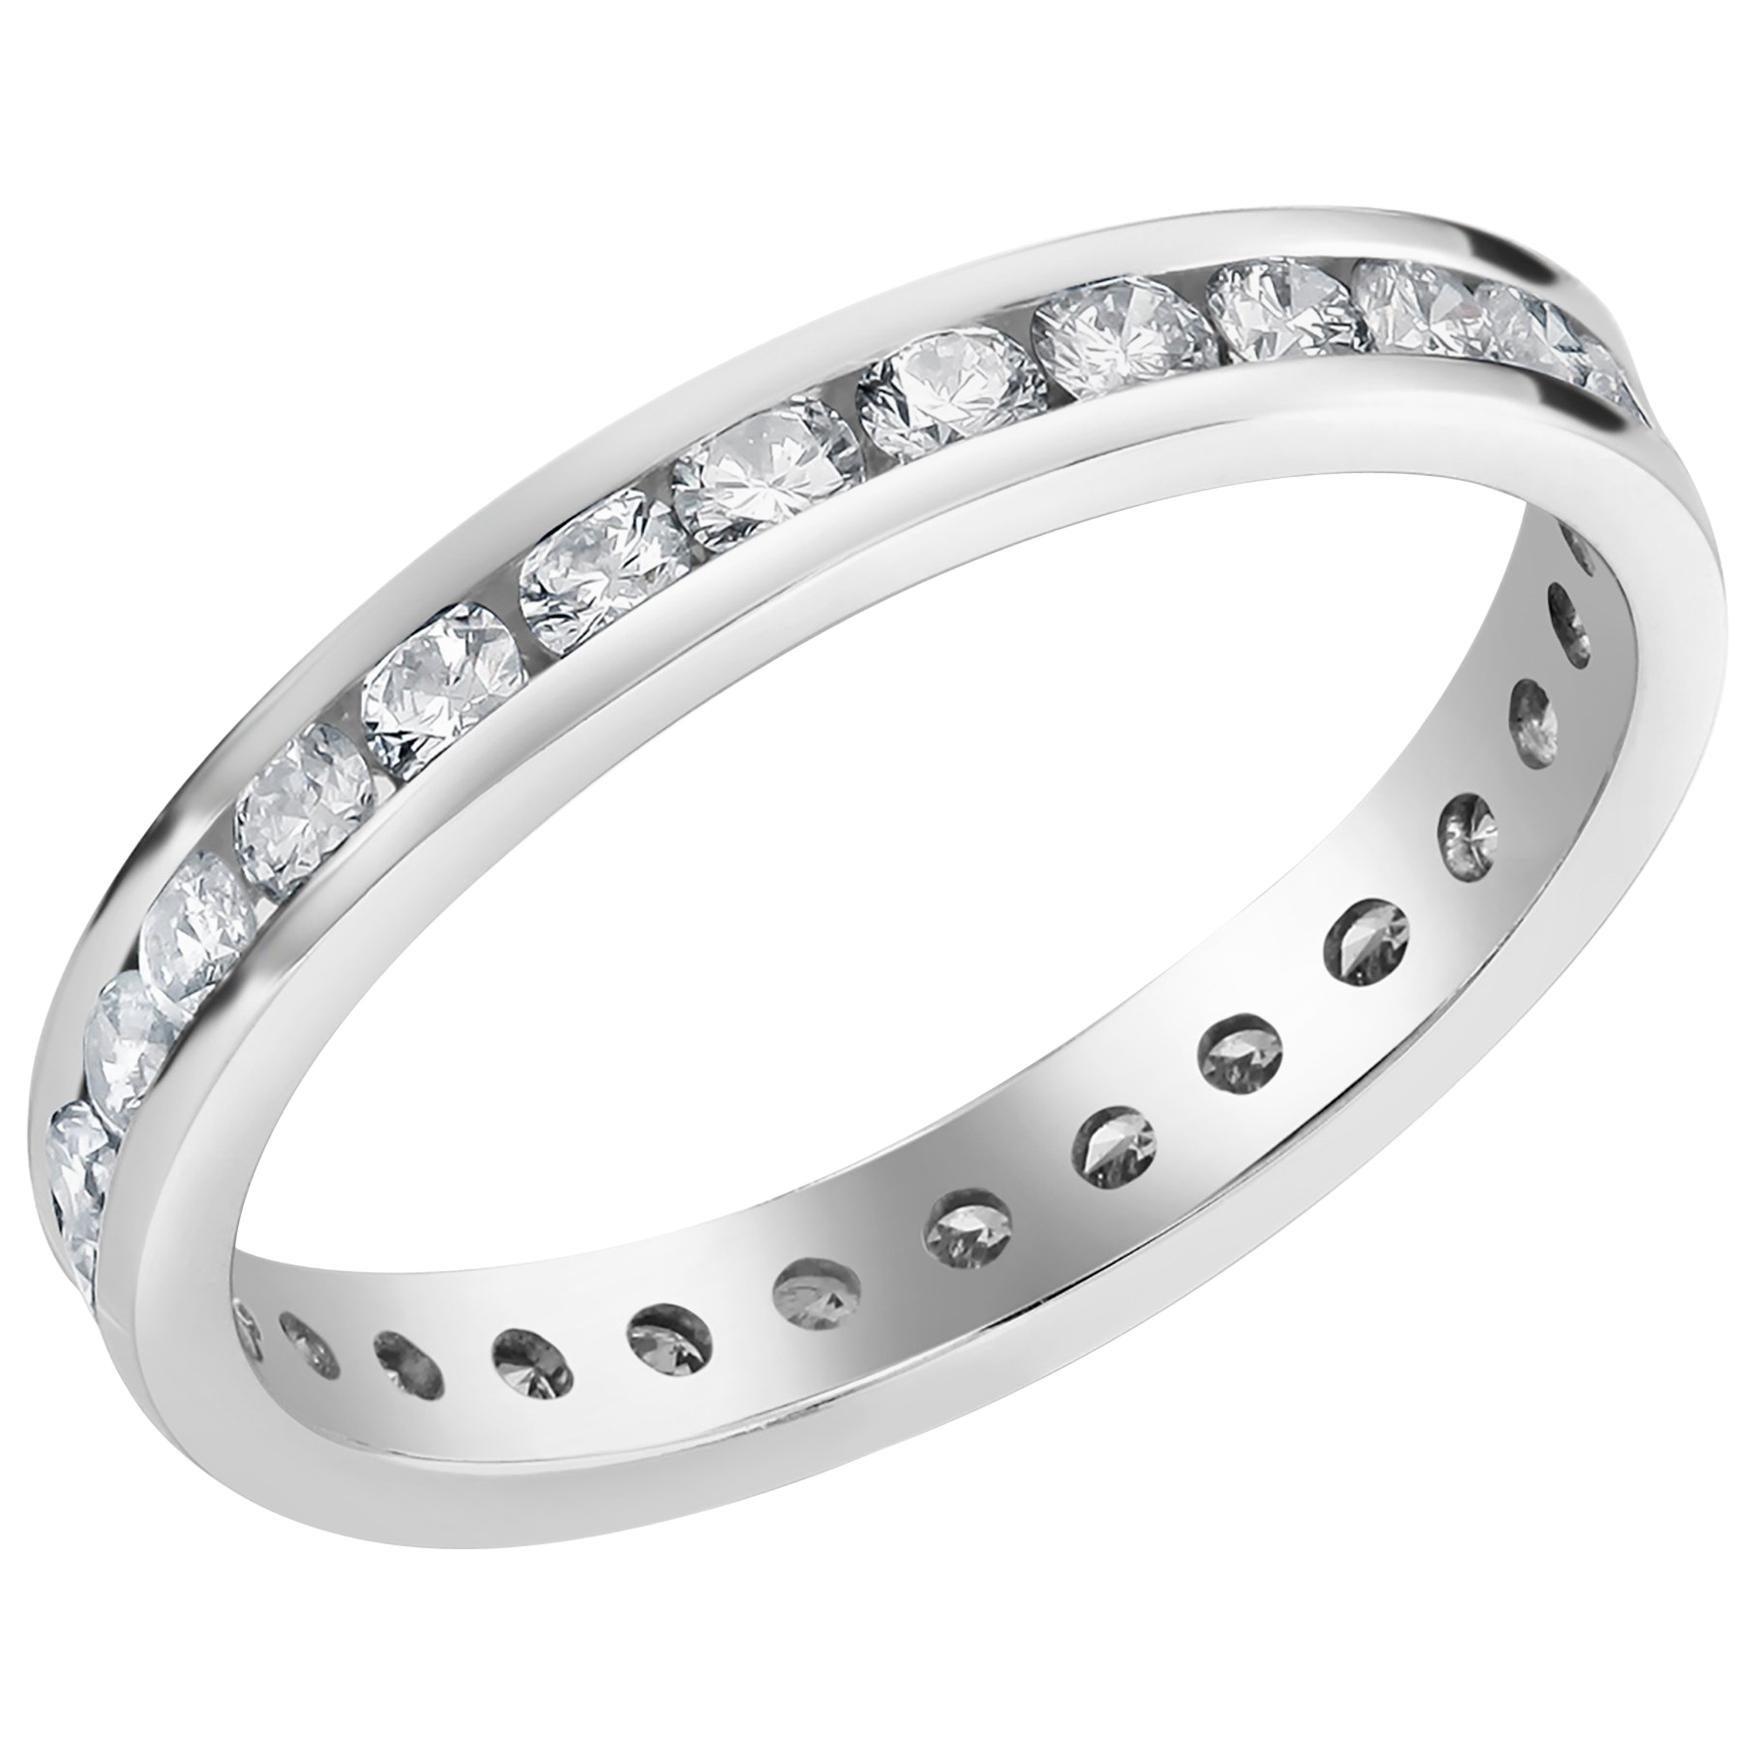 Platinum Channel Set Diamond Eternity Band Weighing 1.08 Carat